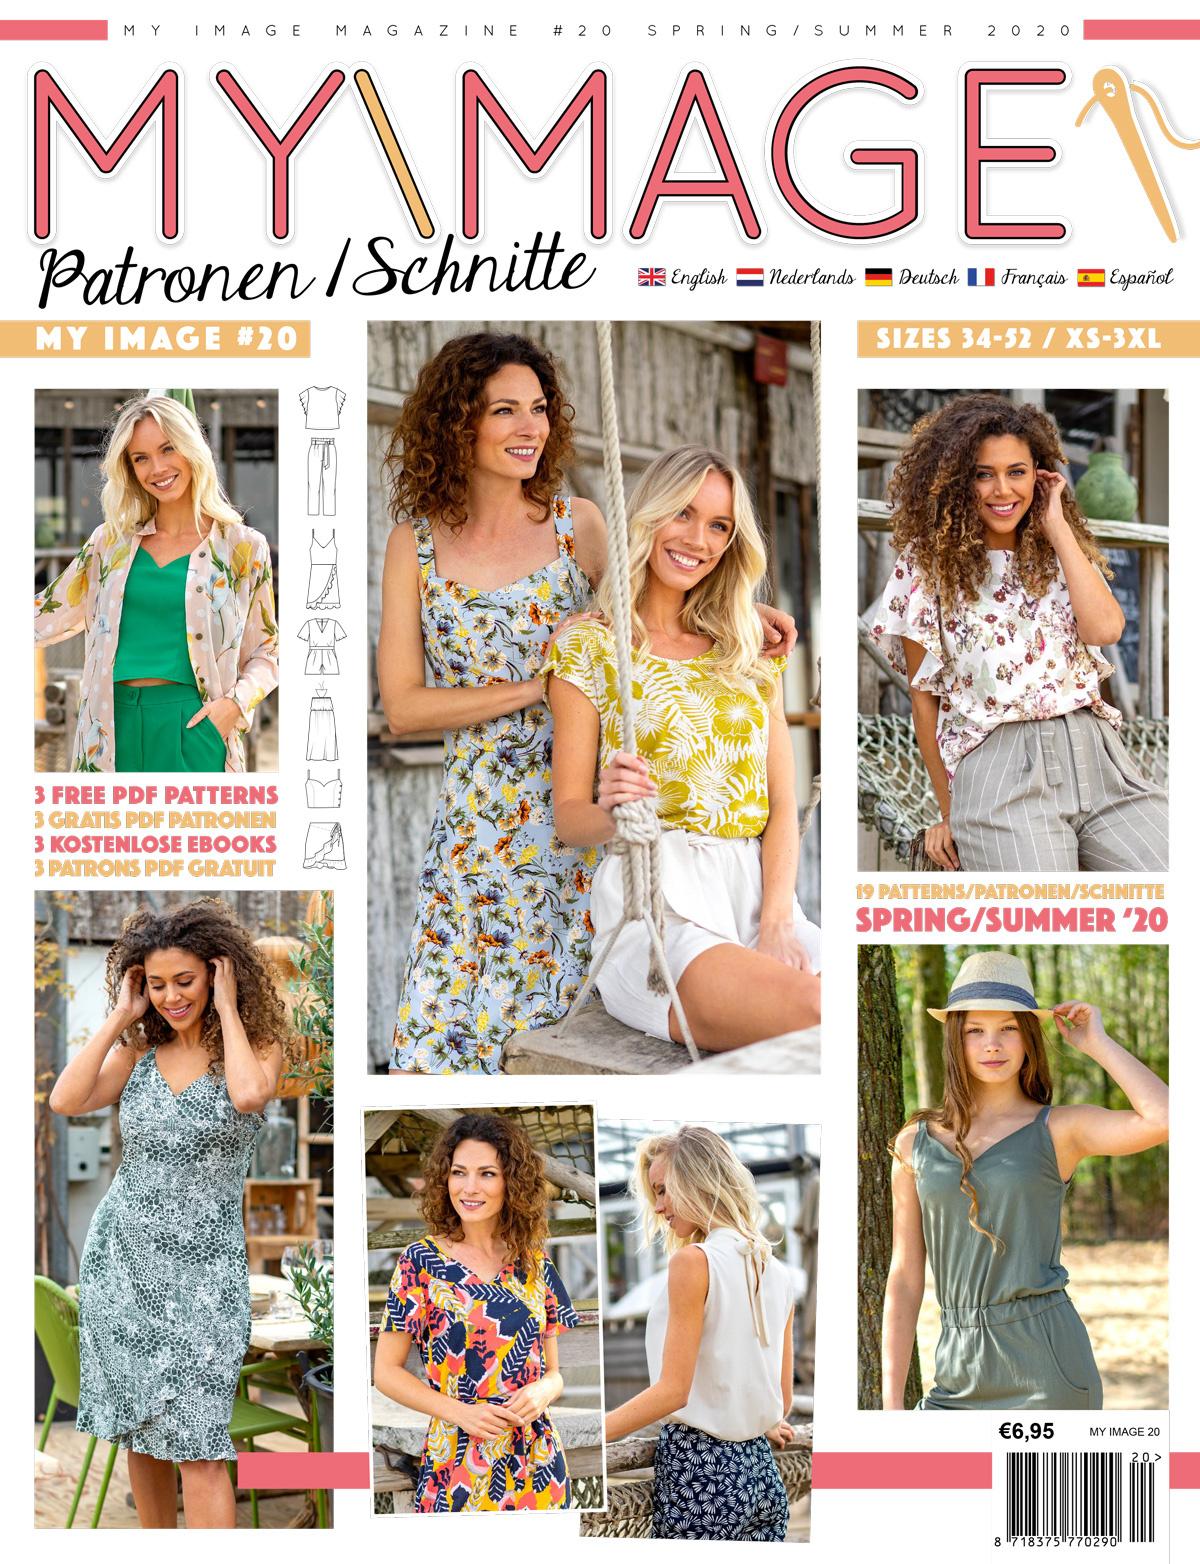 My Image Magazine #20 – Spring/Summer 2020